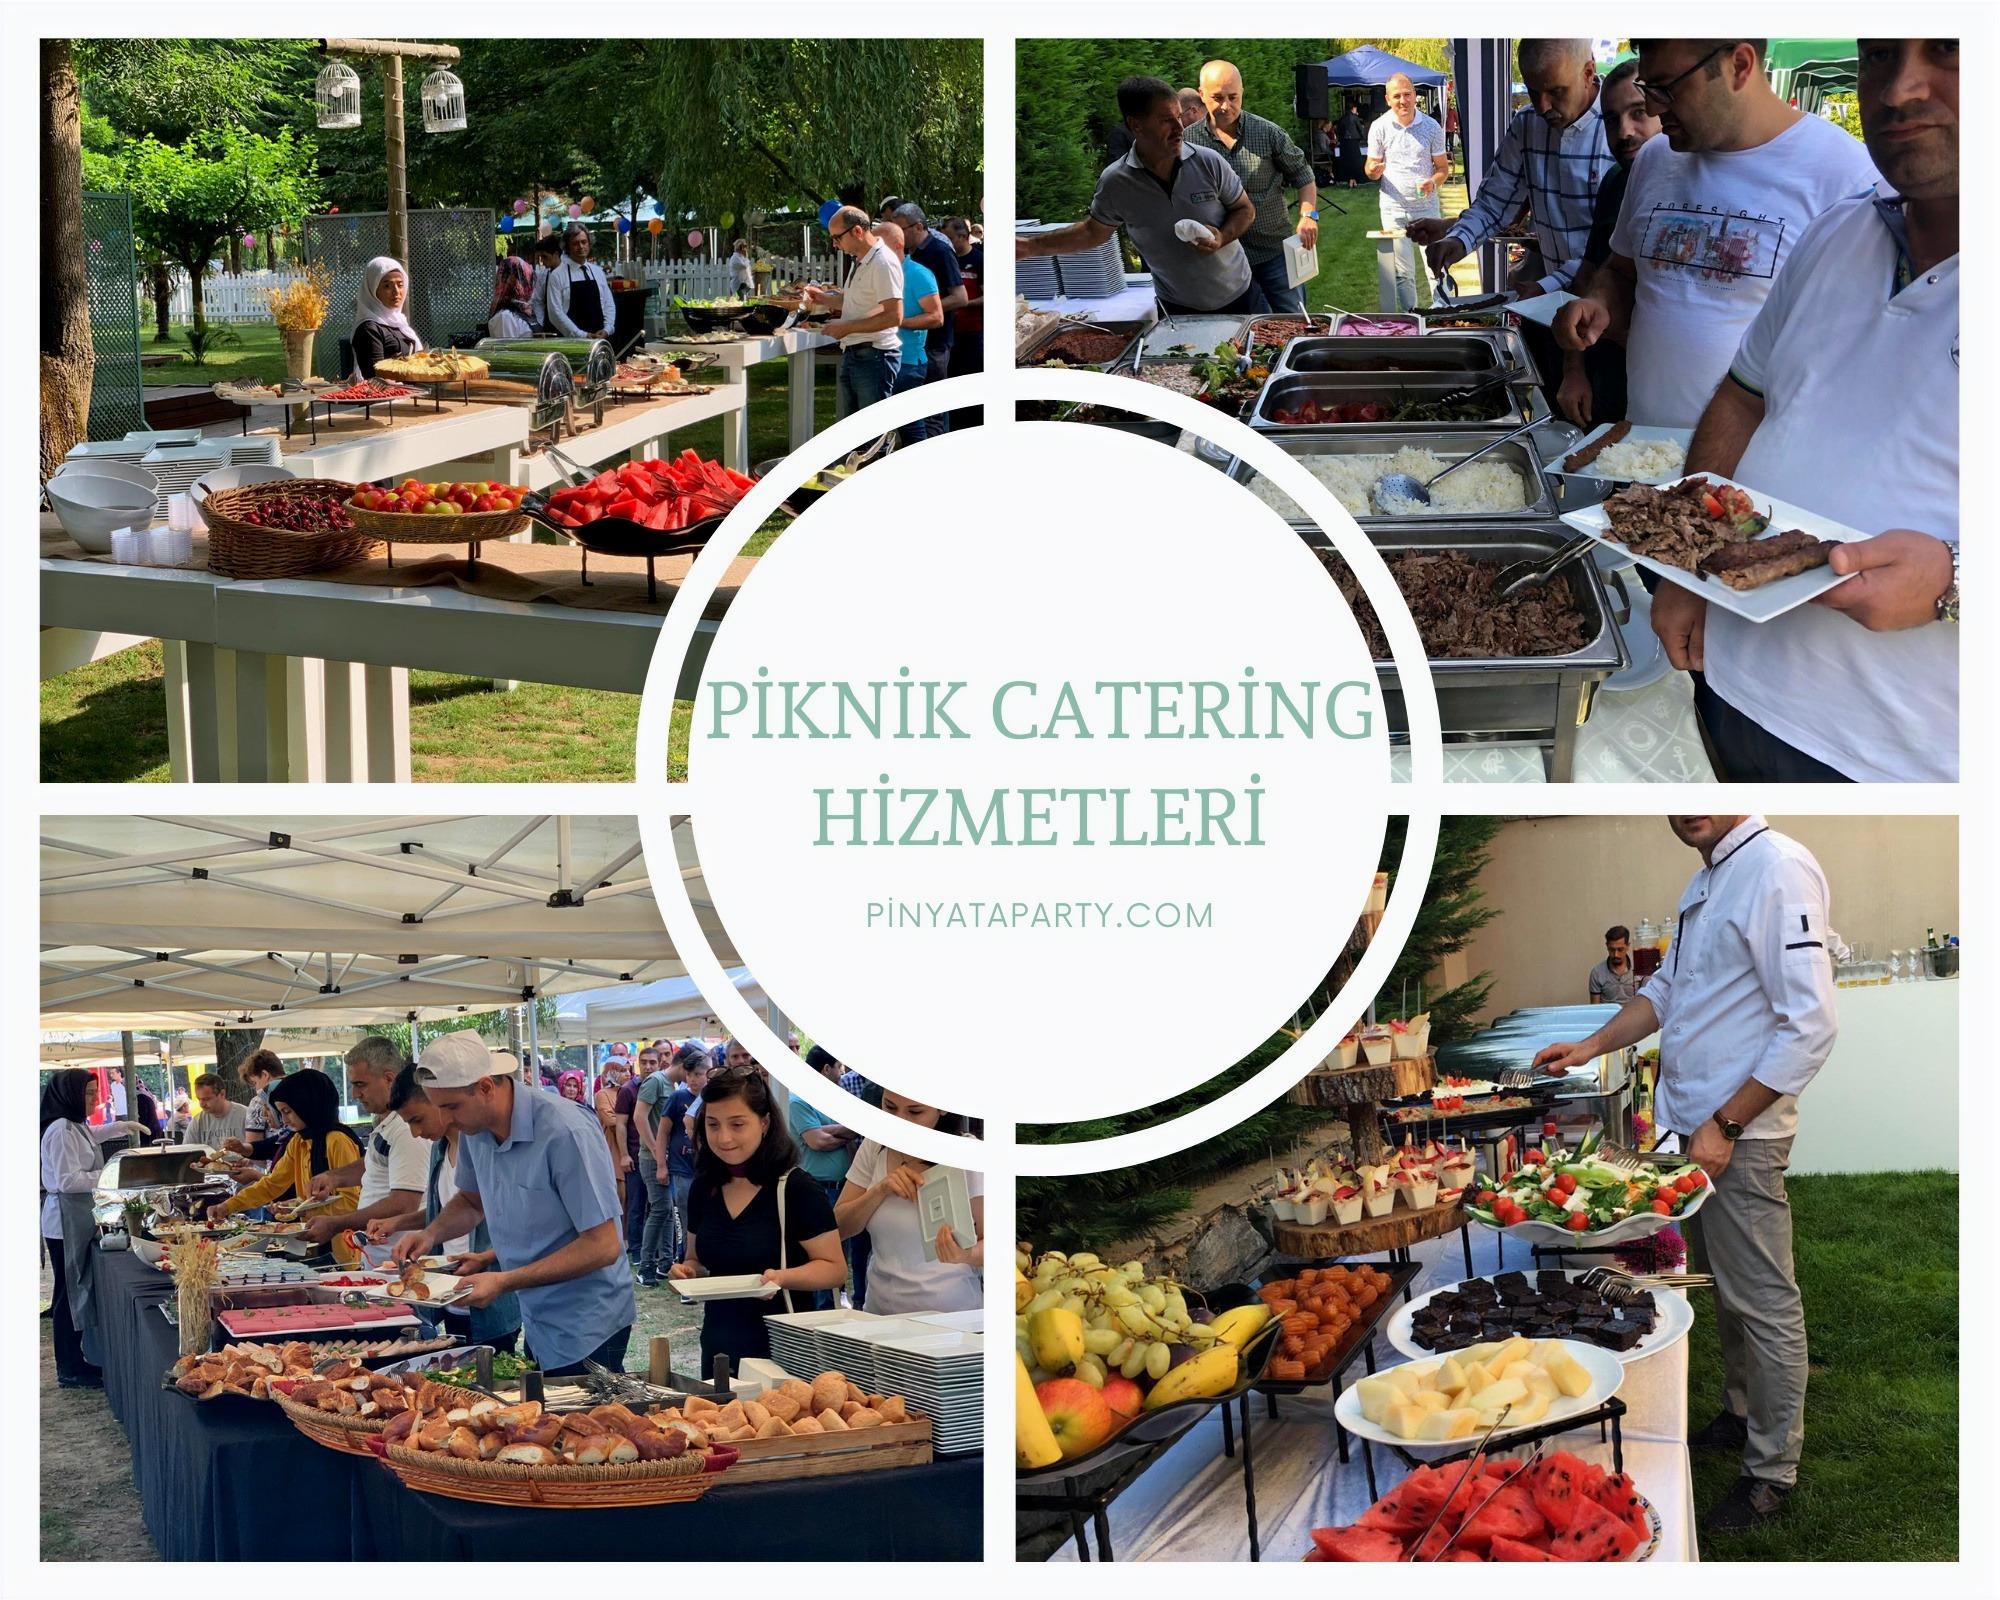 Piknik Catering Hizmetleri